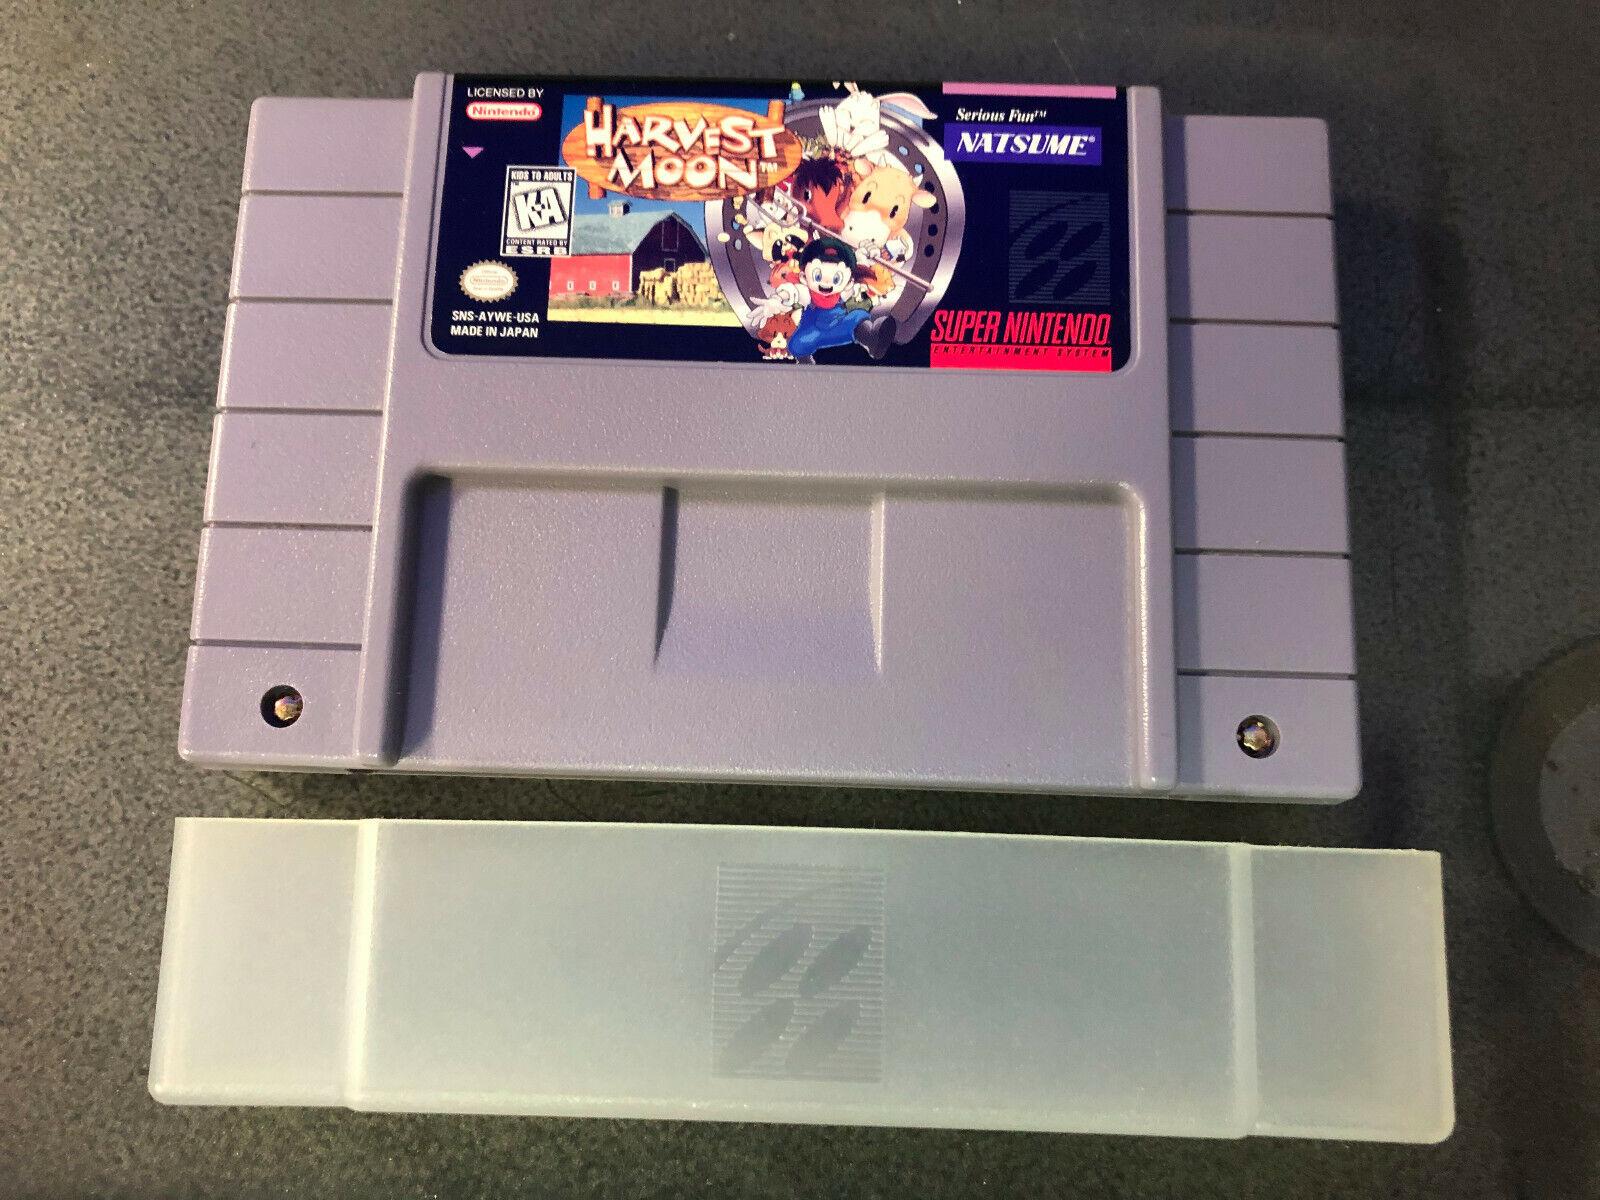 Harvest Moon Super Nintendo Entertainment System SNES, 1997 Authentic Saves - $355.00